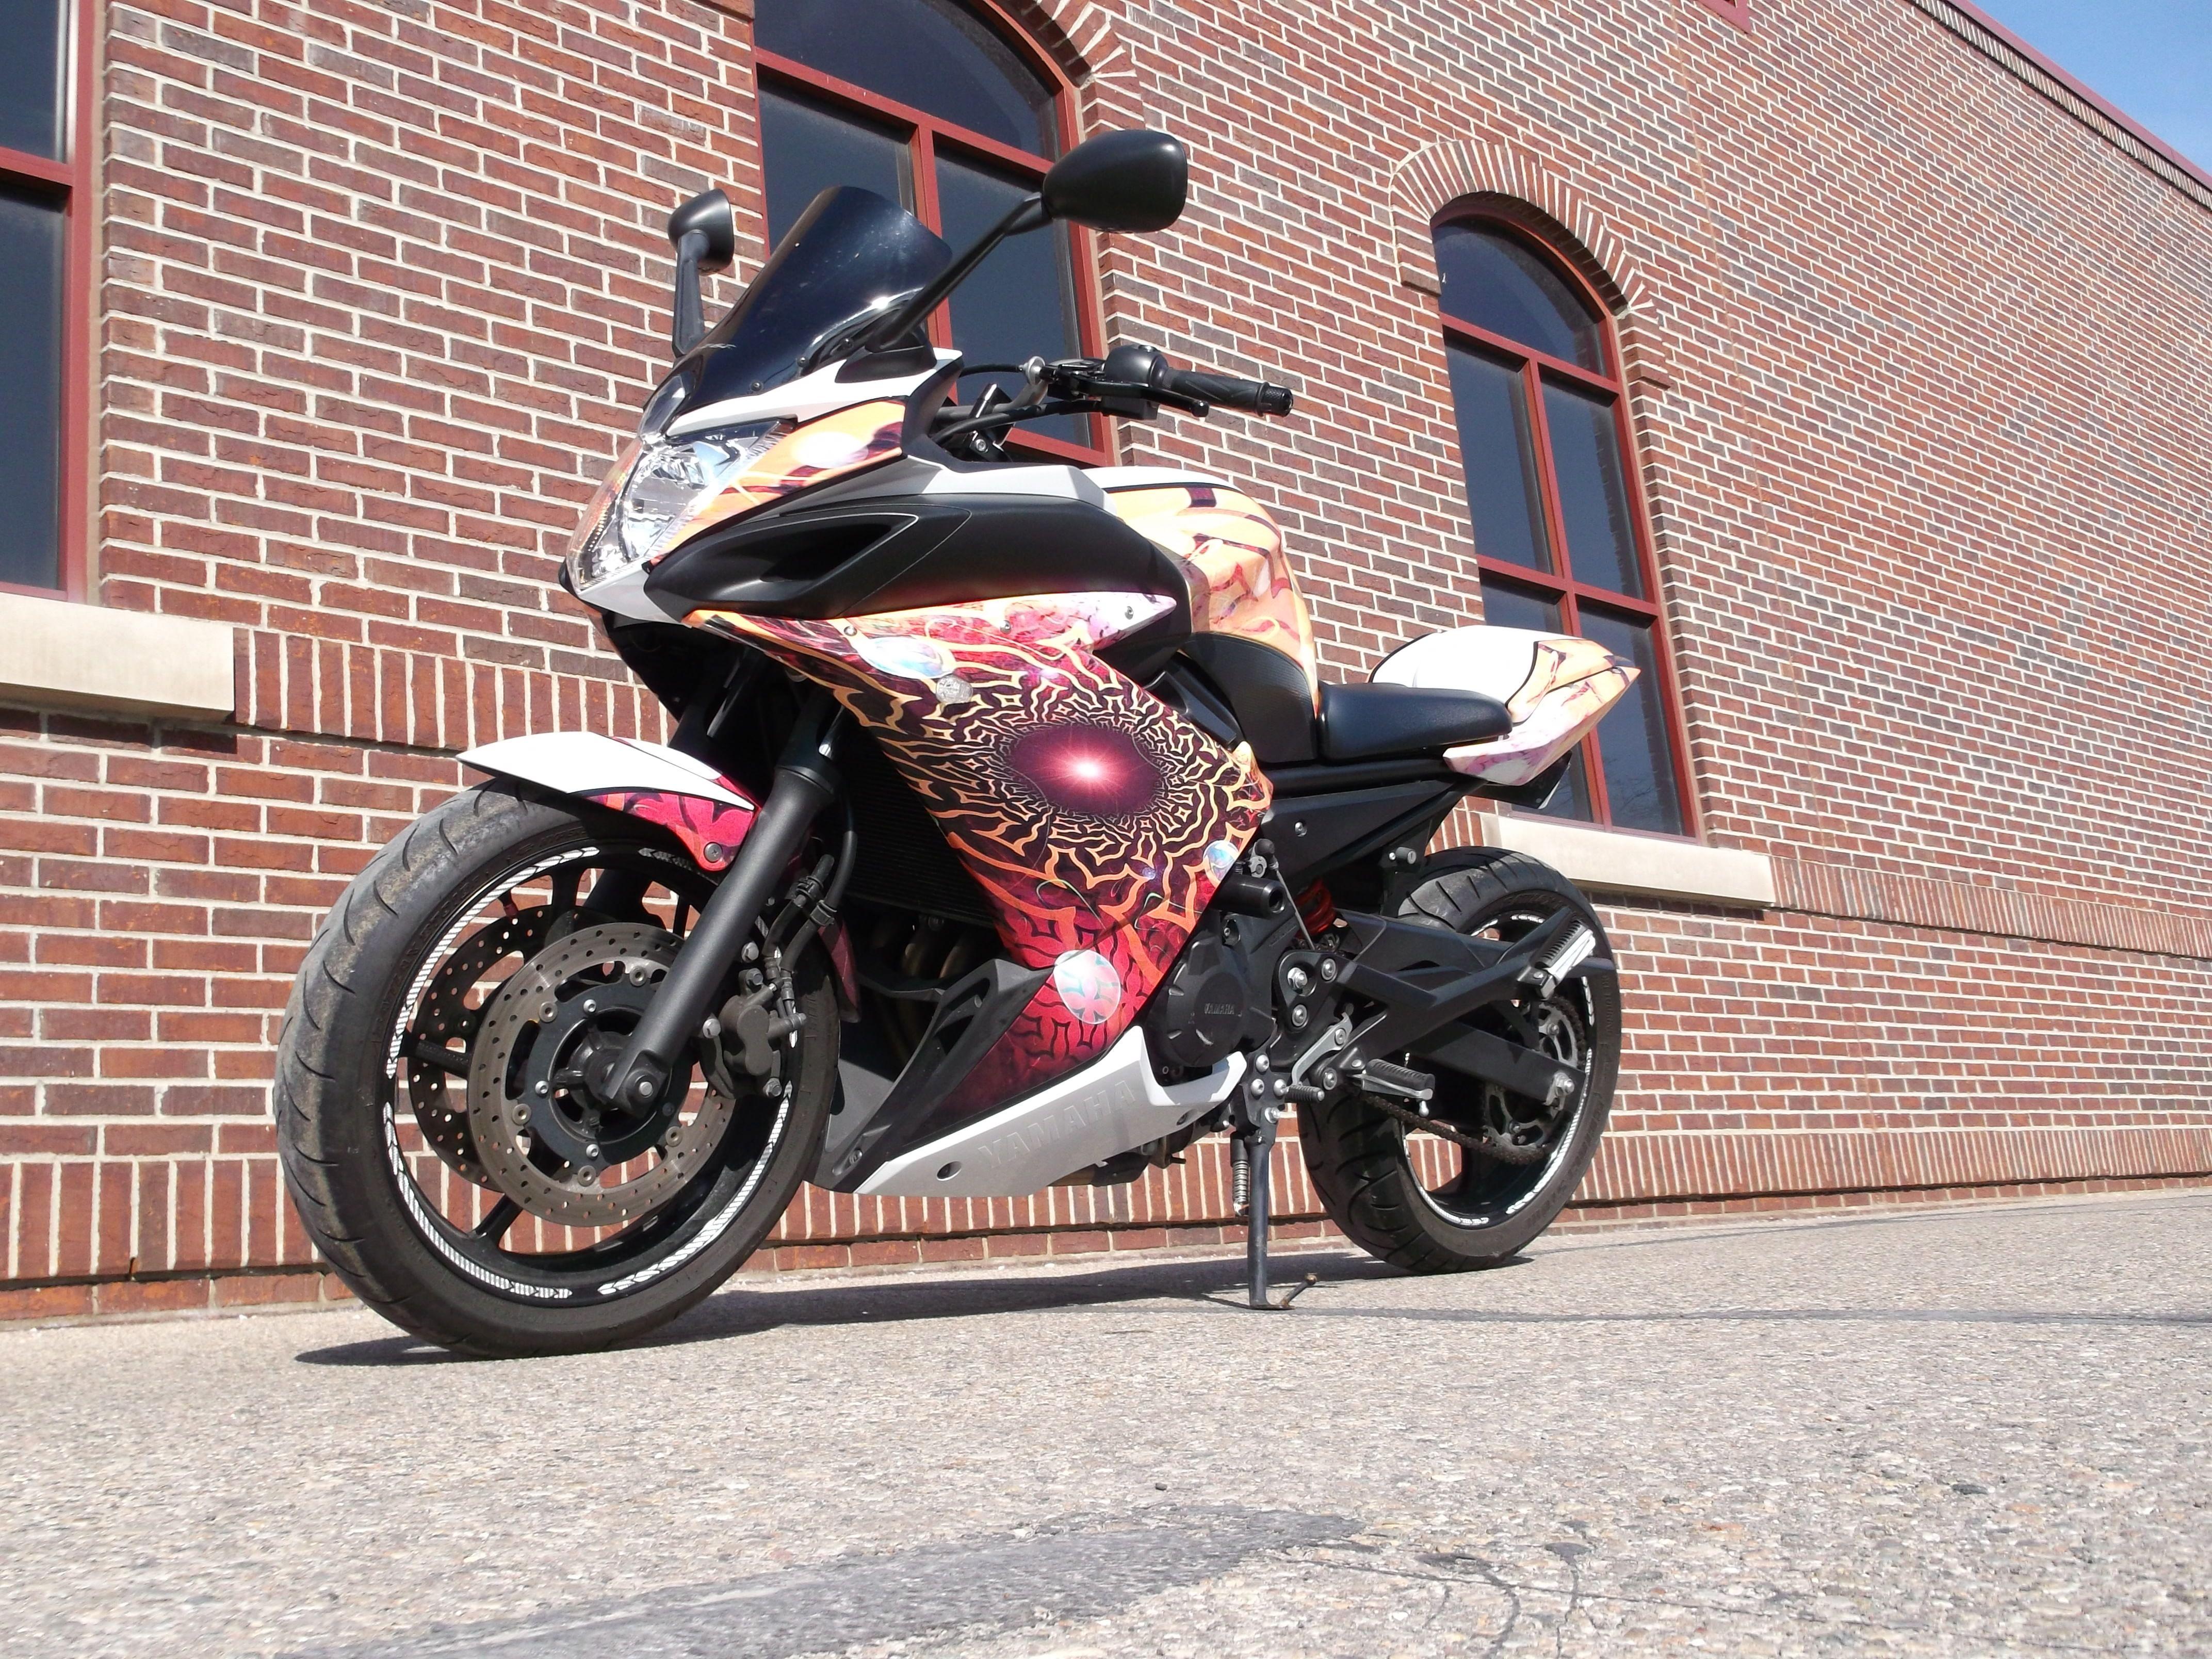 Yamaha Motorcycle Wrap Motorcycles Pinterest Yamaha